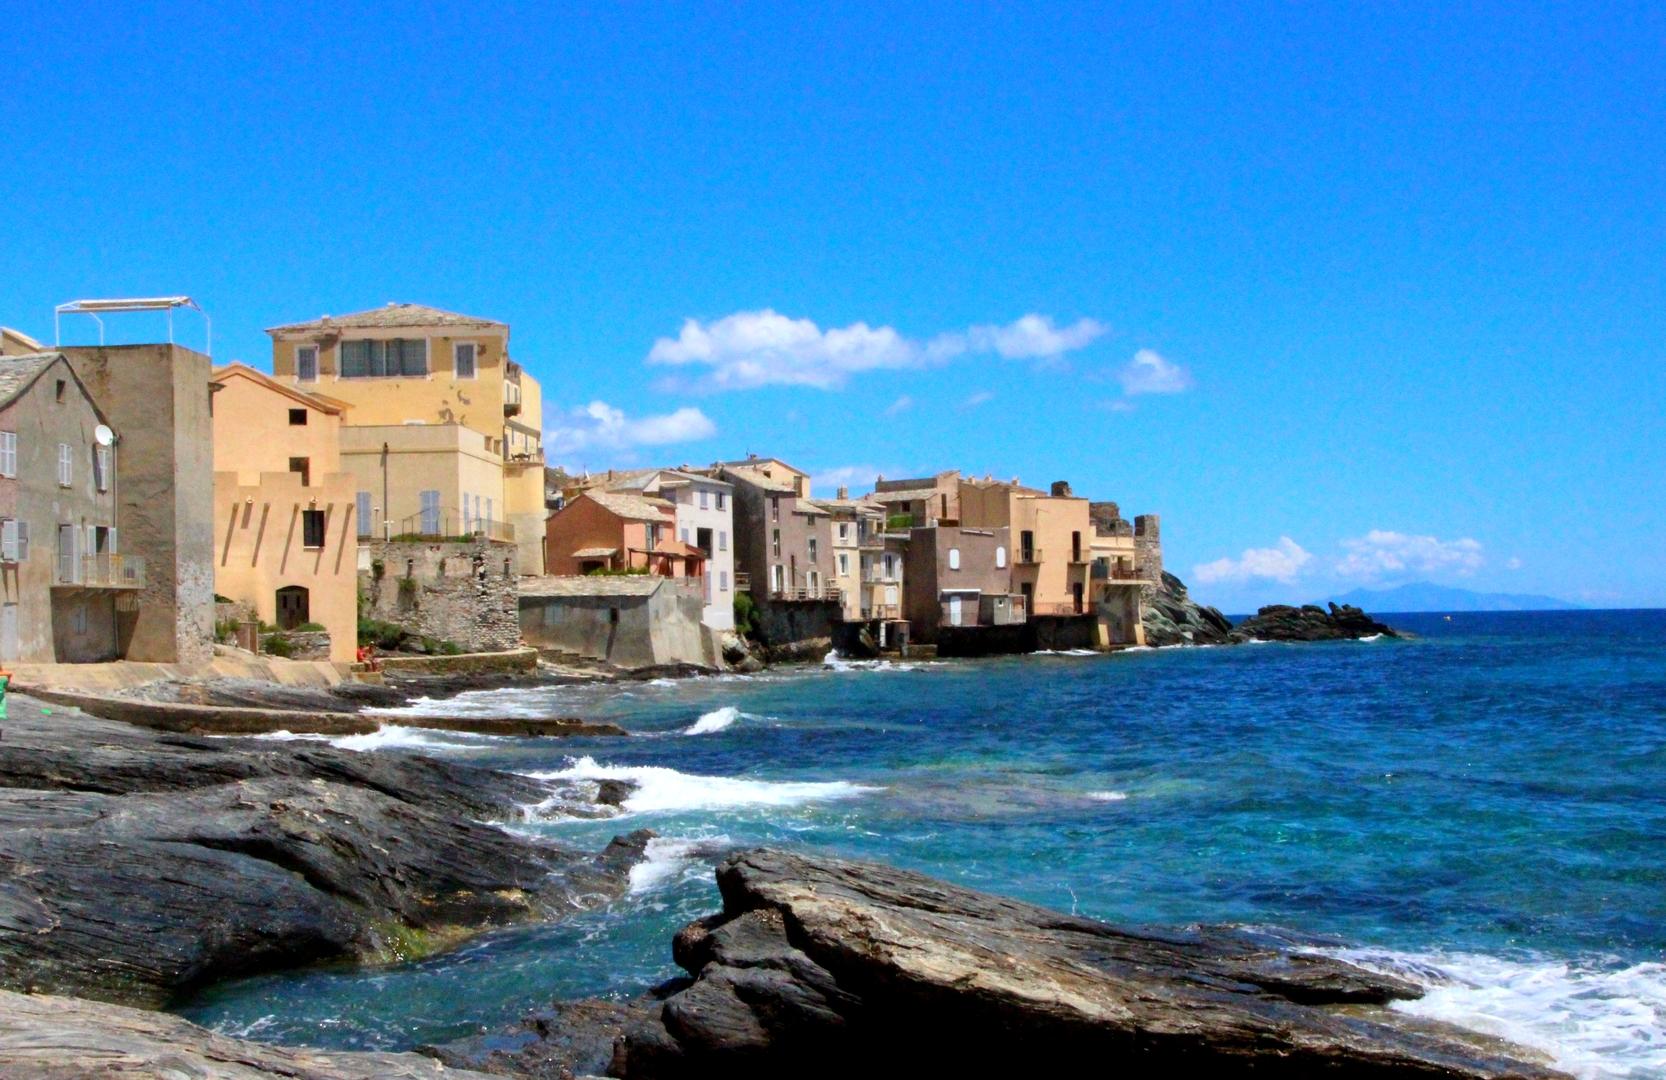 Corse - Village d'Erbalunga construit sur la mer, Cap Corse